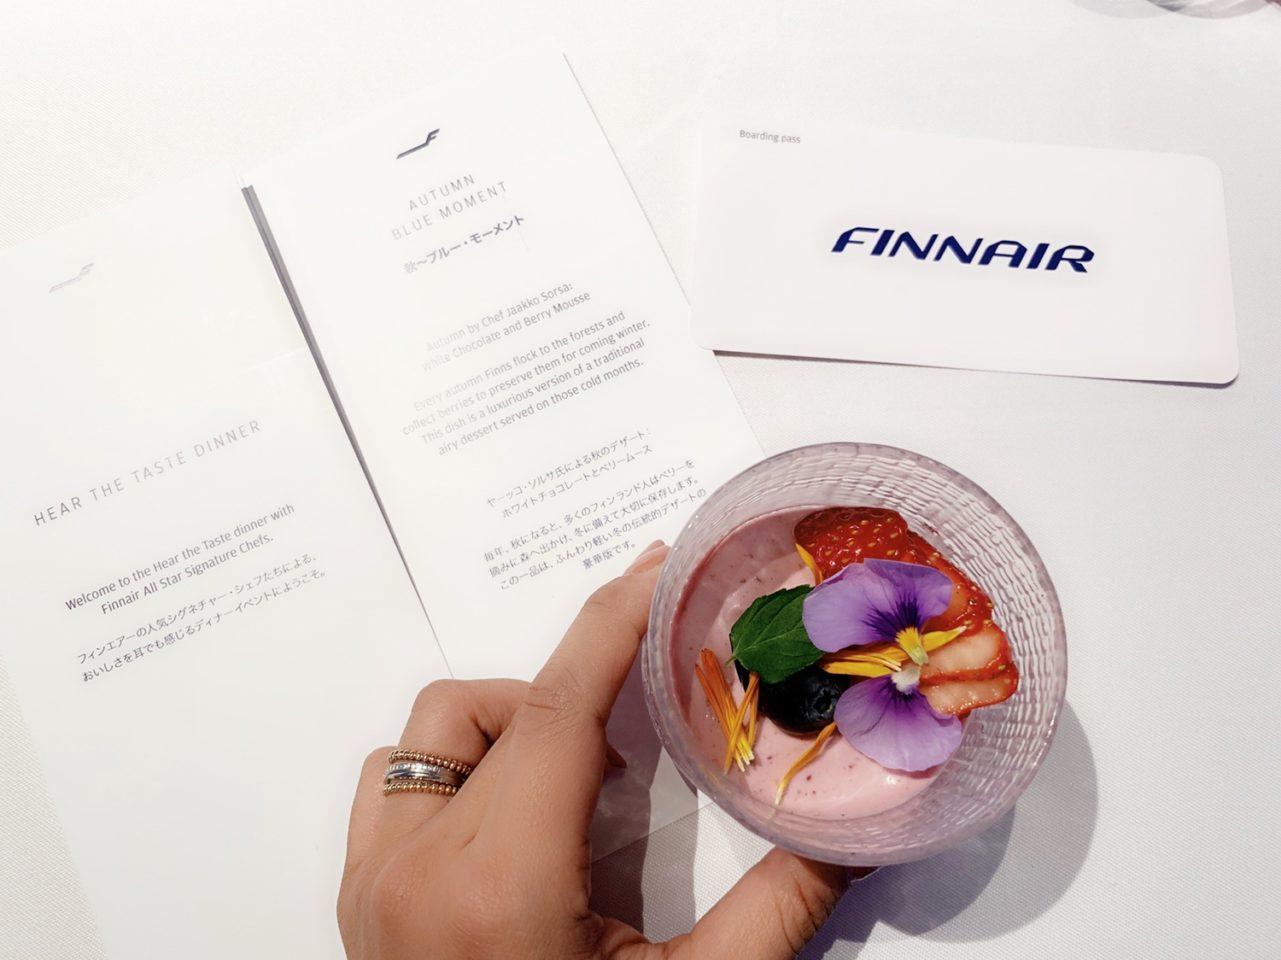 img 8479 - HEAR THE TASTE DINNER - おいしさを耳でも感じるフィンエアーの魅力的な北欧料理